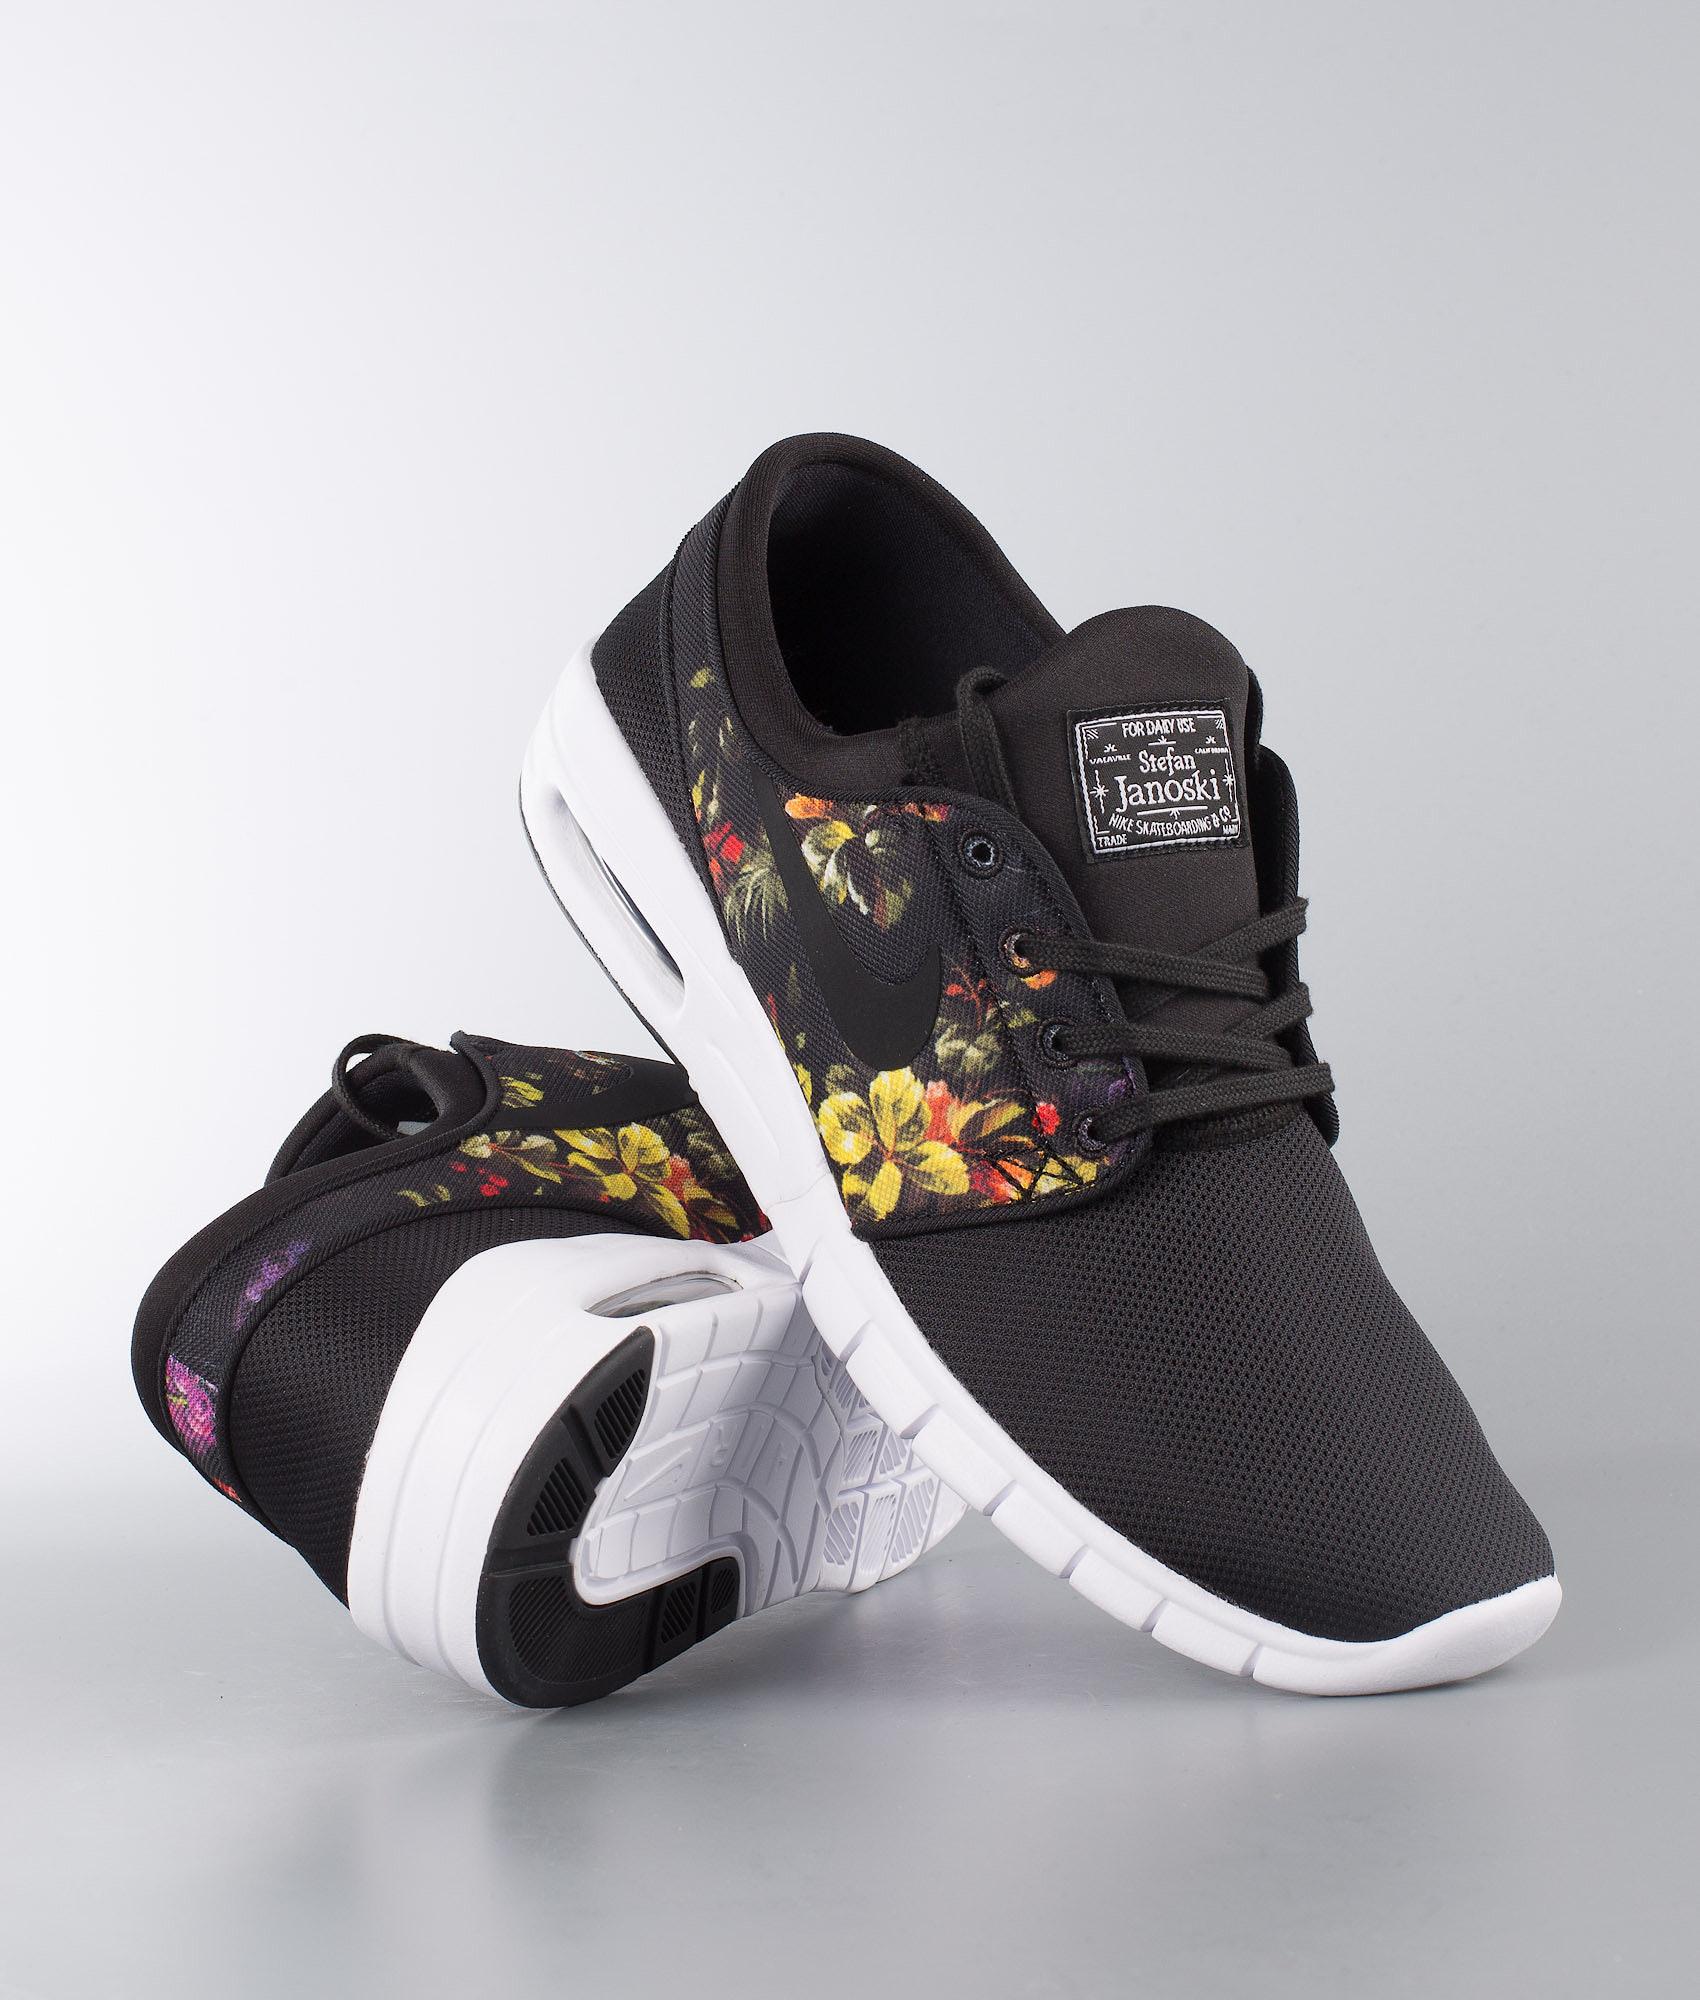 low priced b04f9 2d9b2 Nike Stefan Janoski Max Shoes